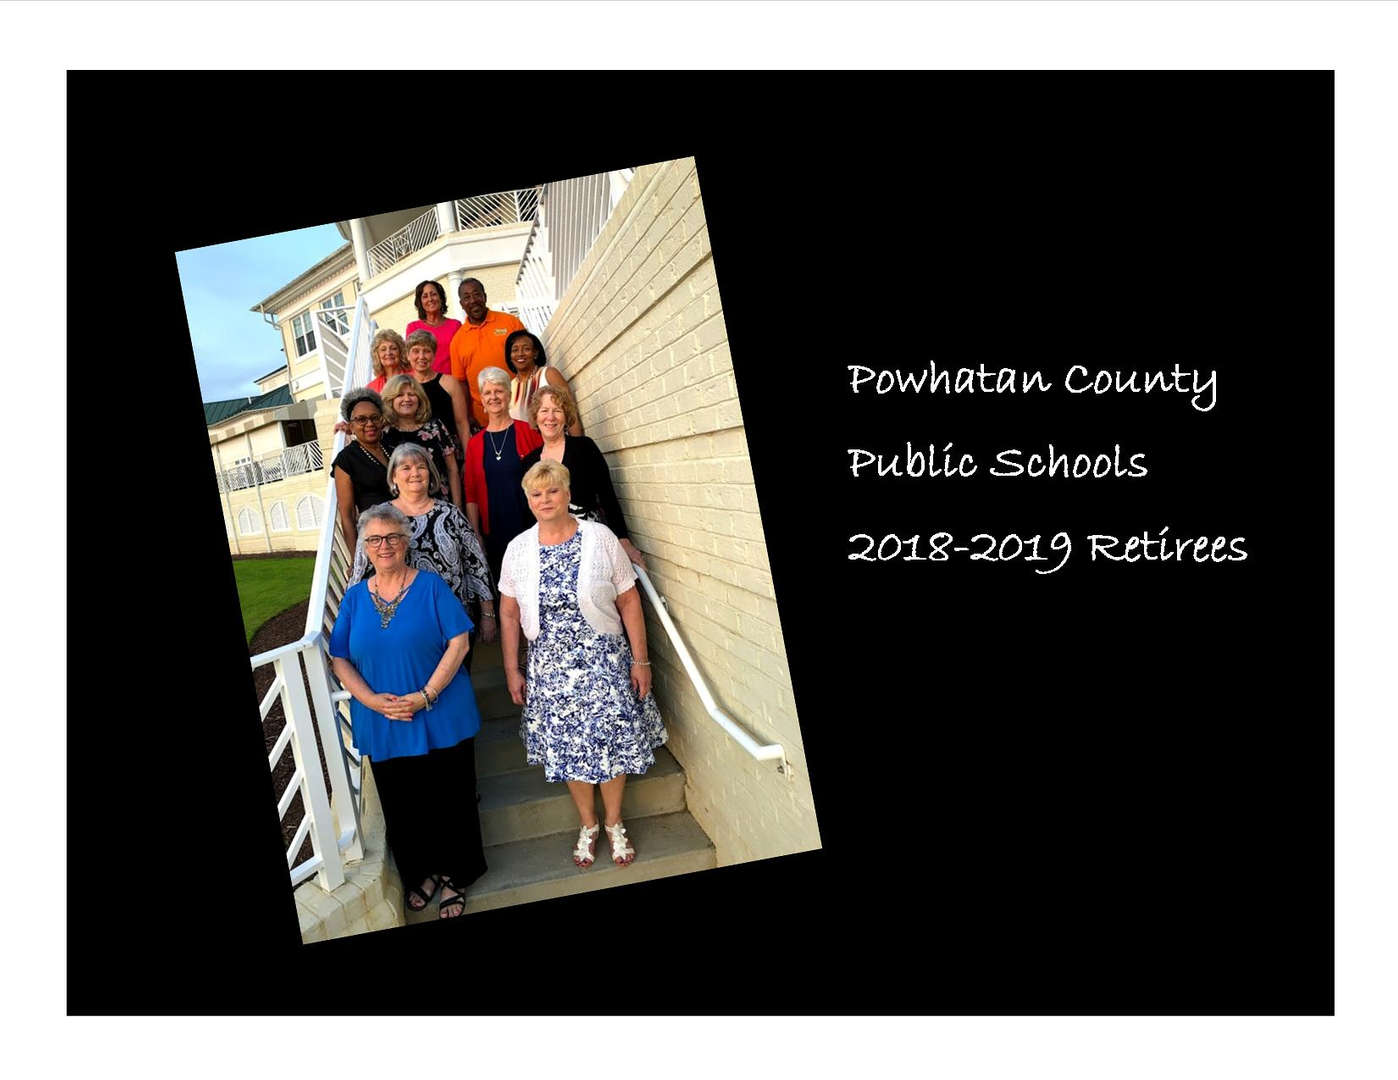 PCPS 2018-2019 Retires